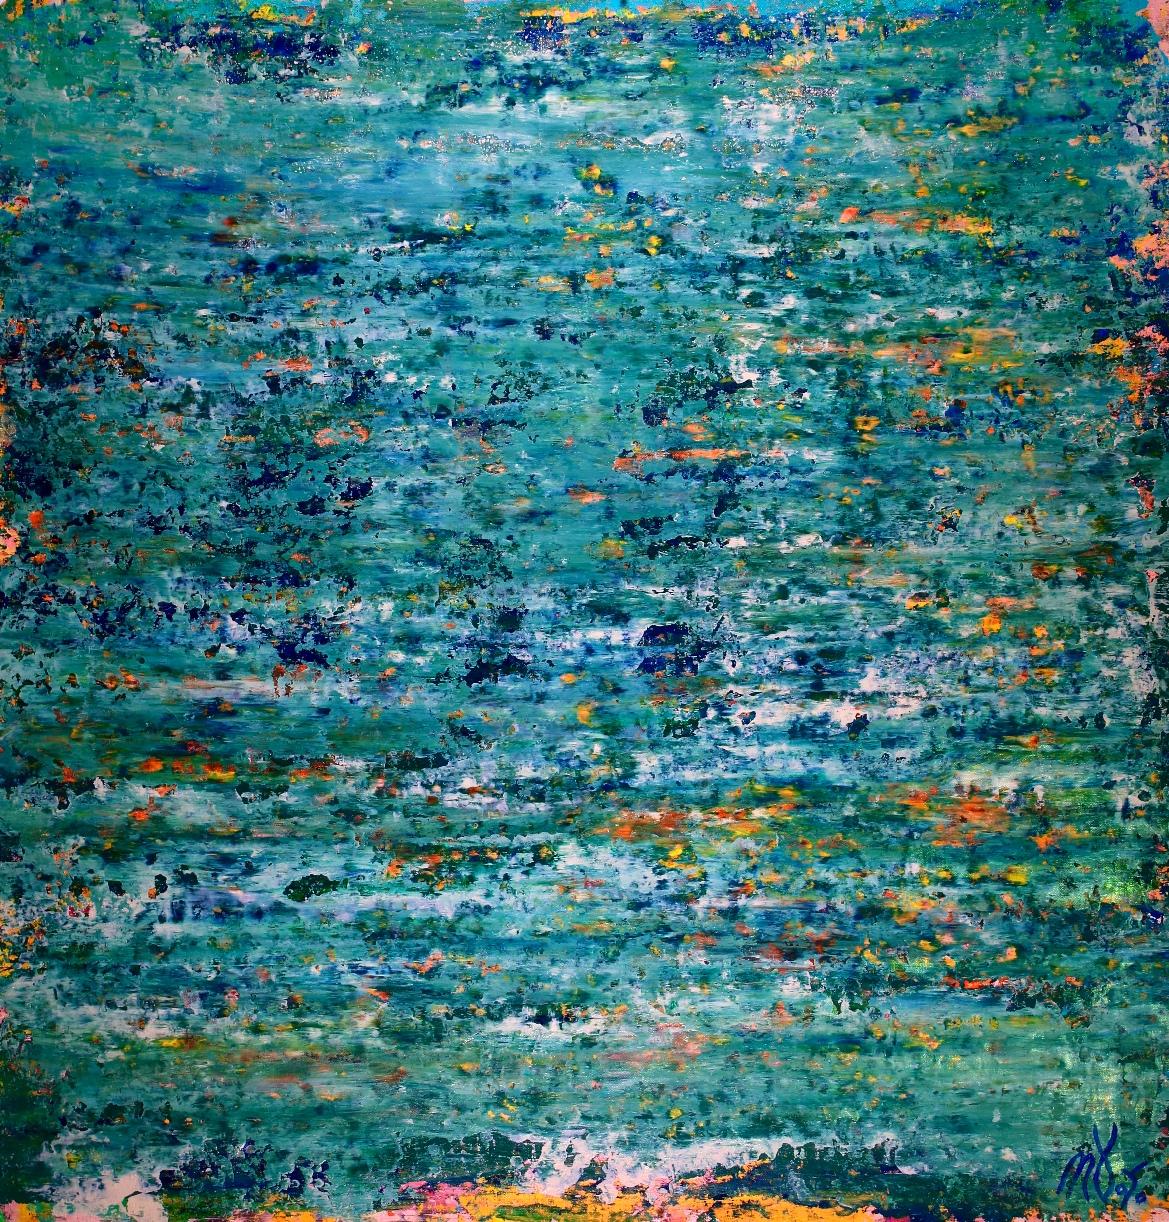 Full Painting - Vernal creeks by Nestor Toro - (2019)